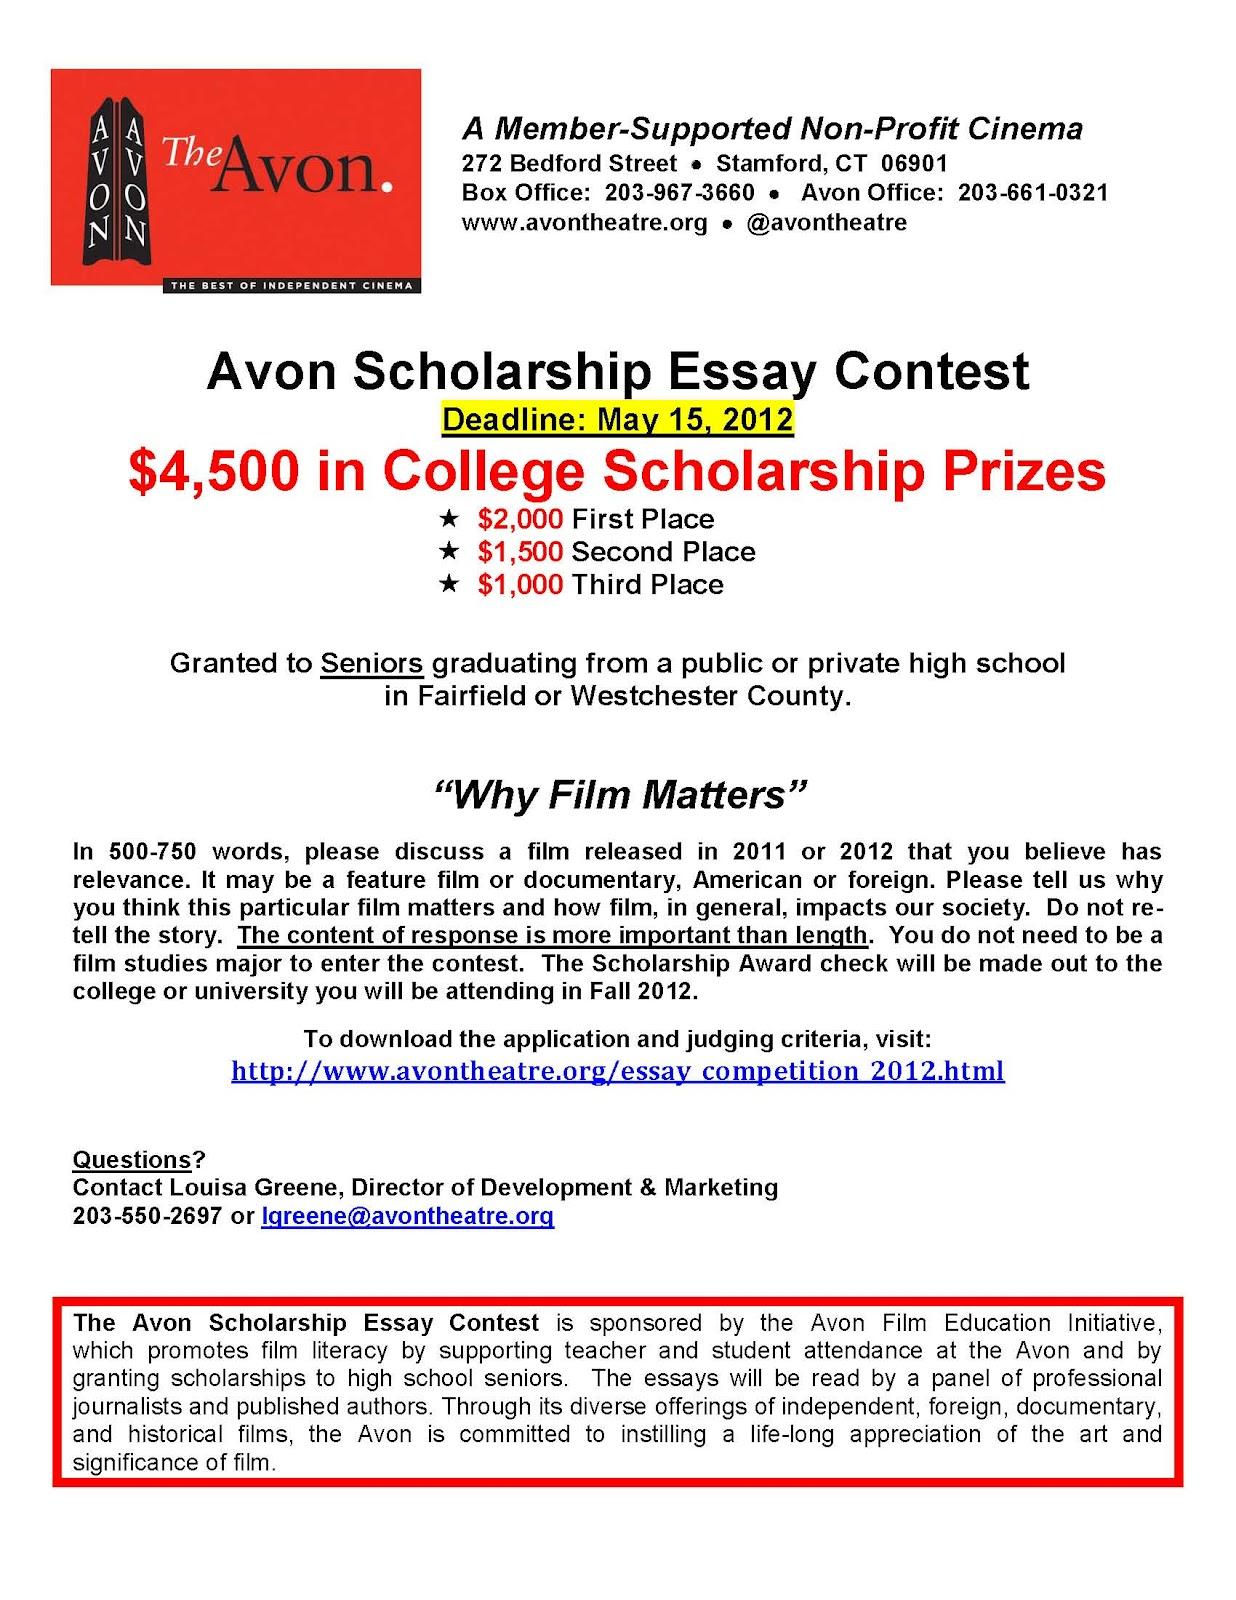 003 Non Essay Scholarships Example No College Scholarship Prowler Free For High School Seniors Avonscholarshipessaycontest2012 In Texas California Class Of Short Imposing Freshman Students 2019 Full